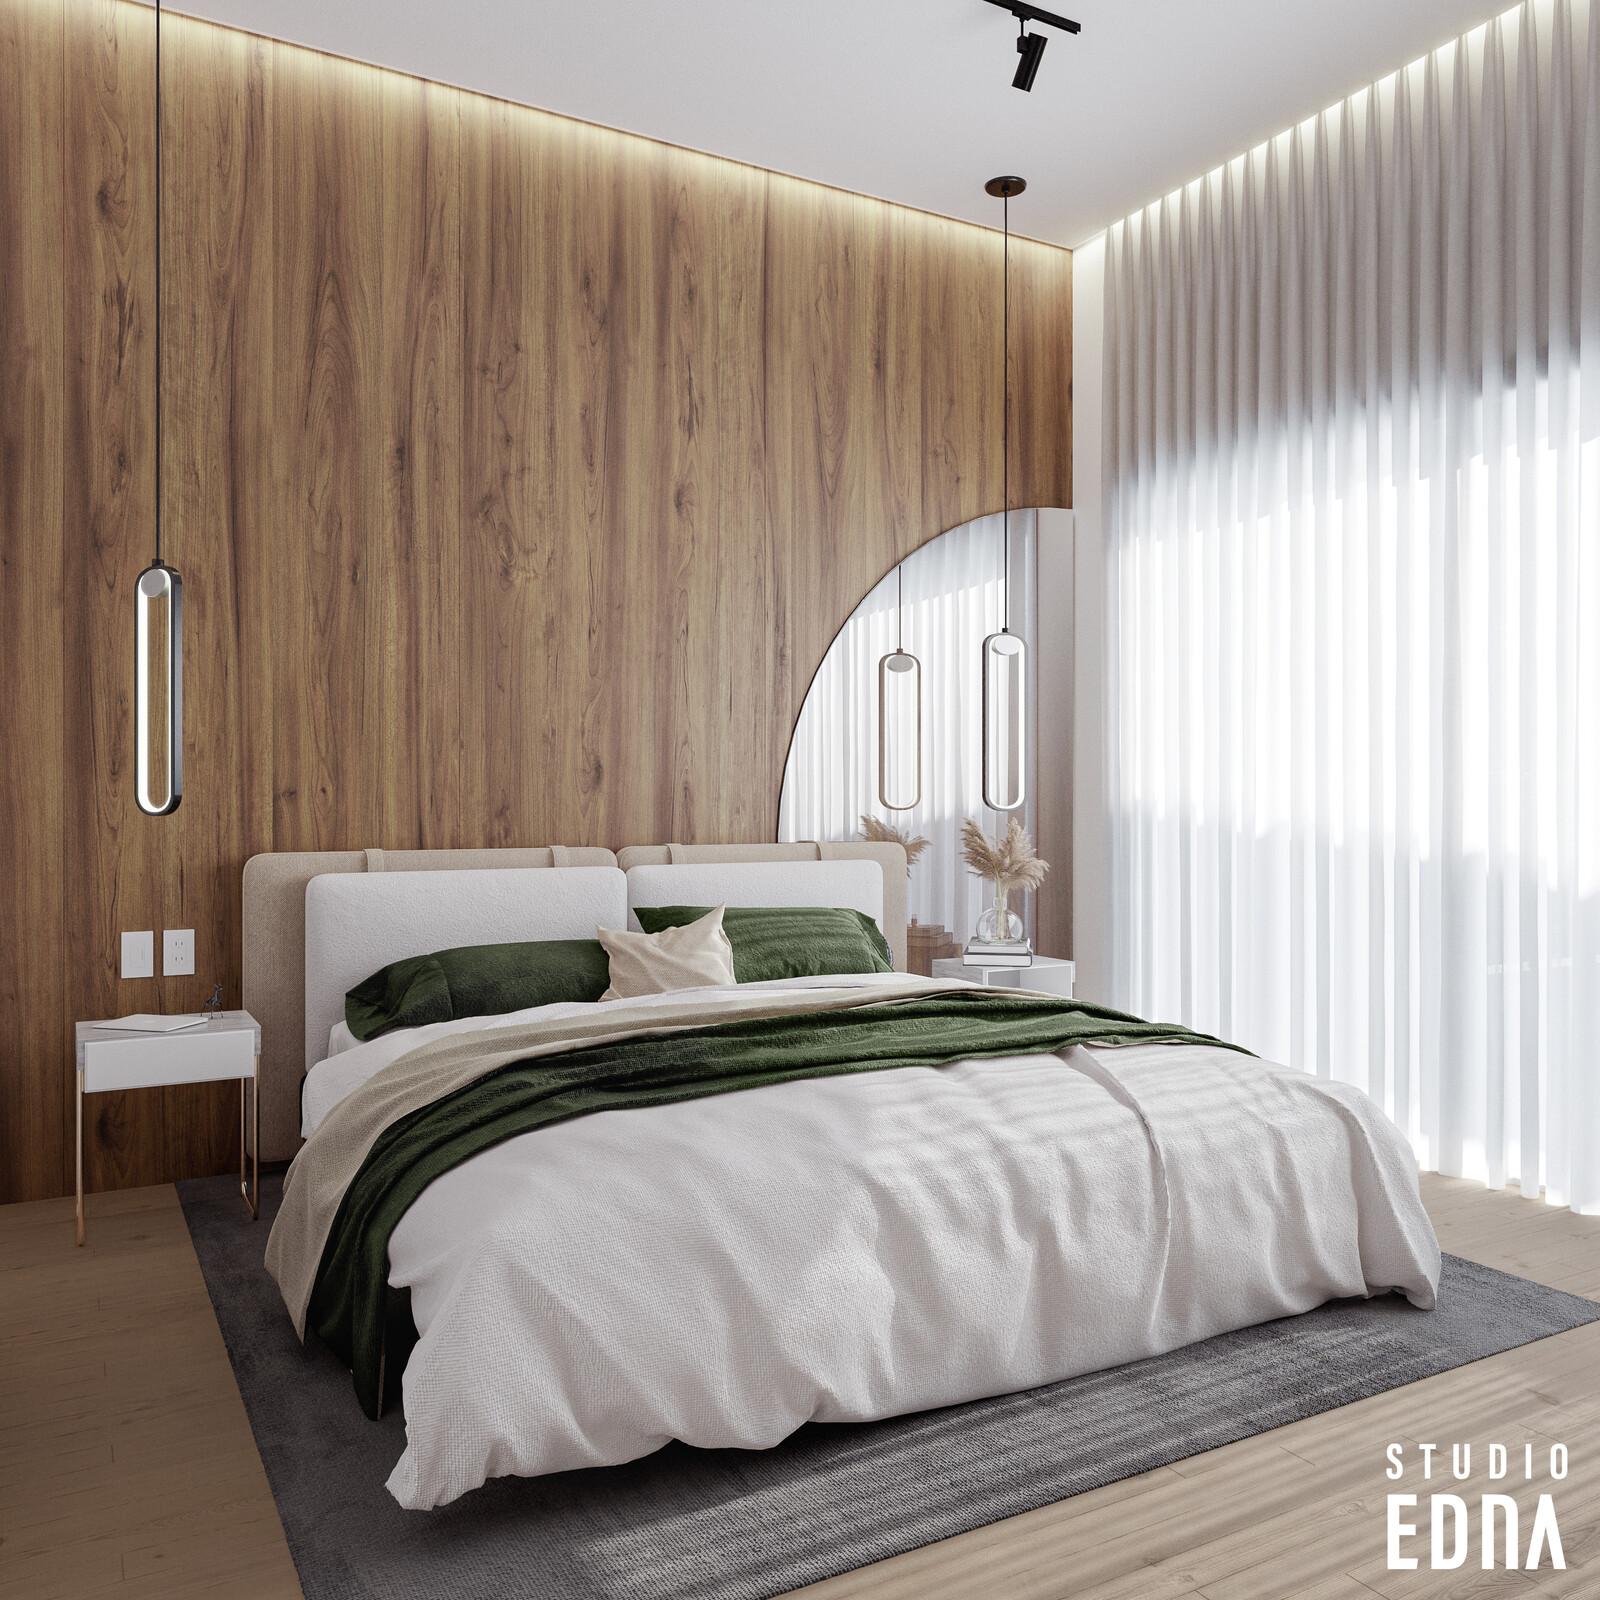 Studio Edna - CG Interior